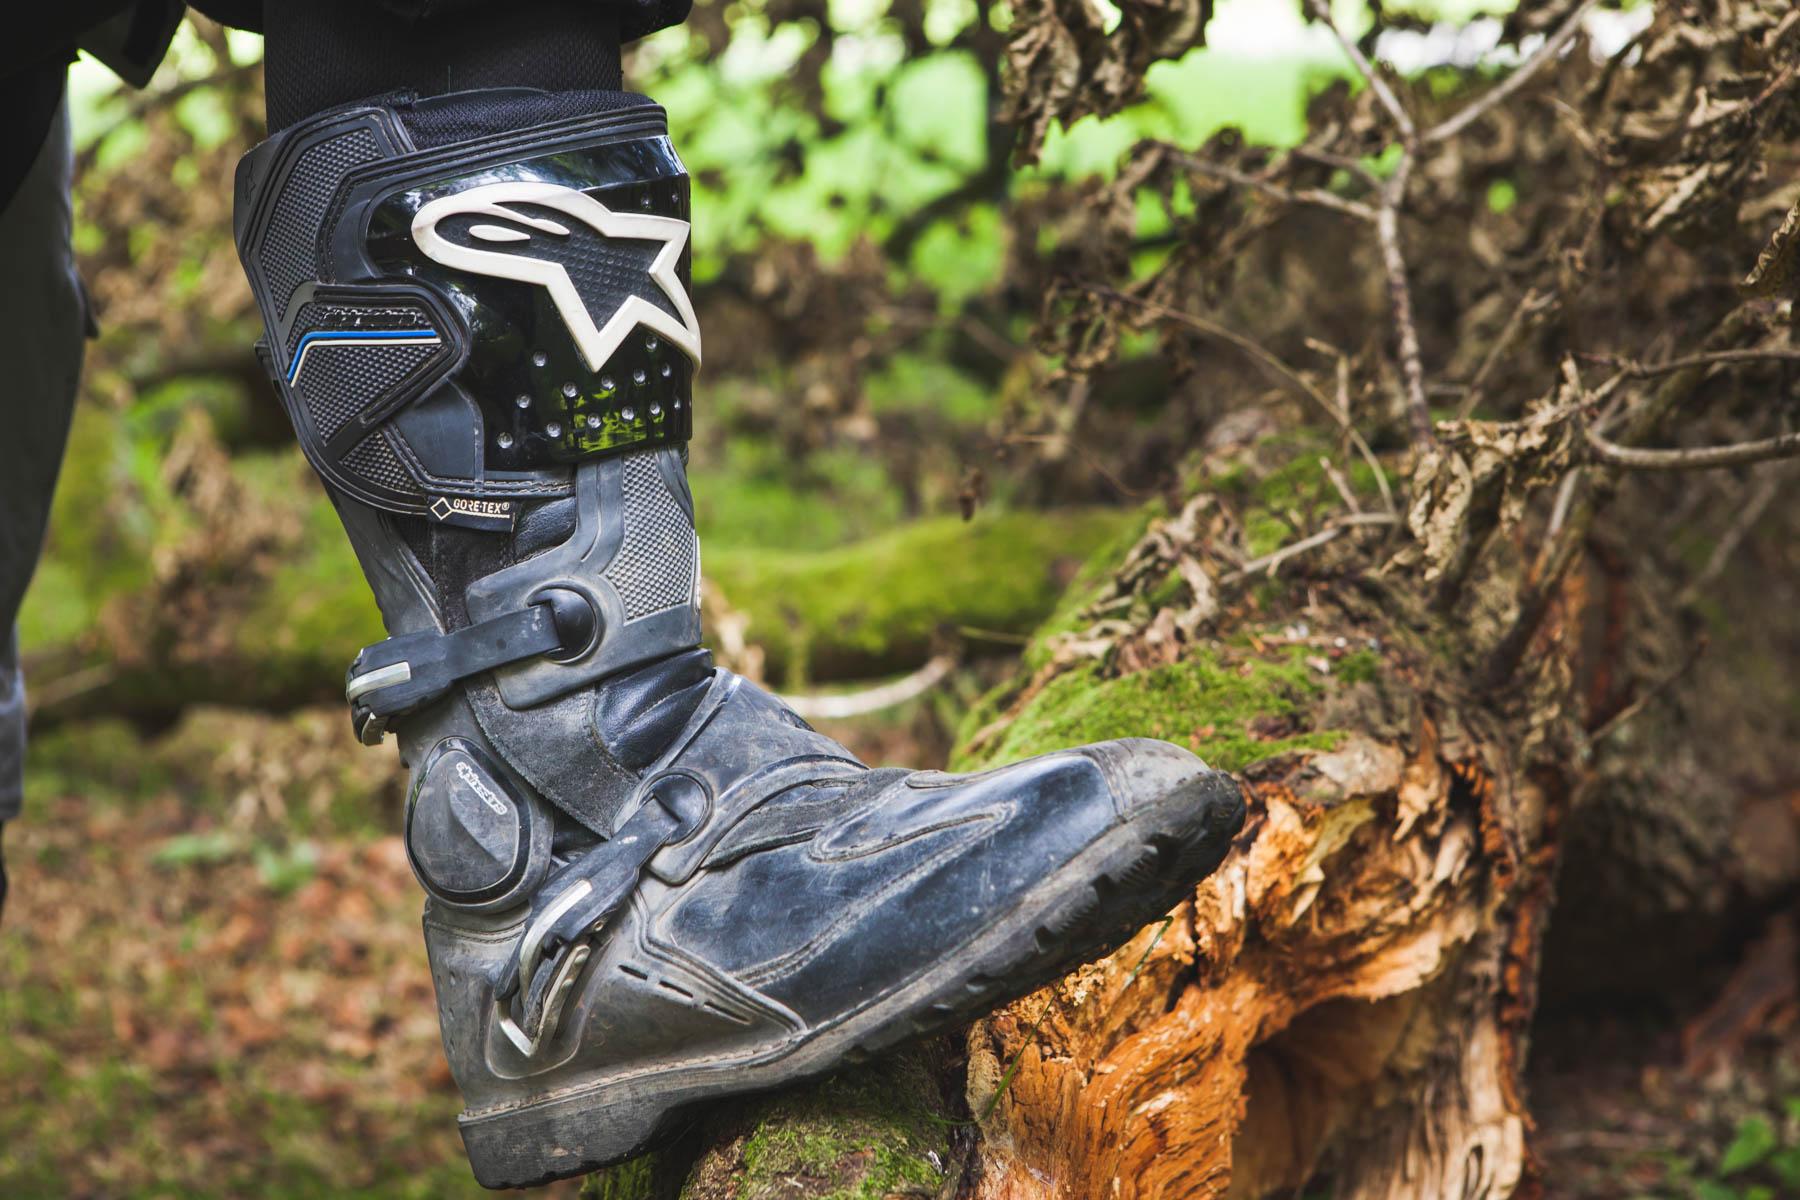 1e7ce50cbbb559 Rated - Alpinestars Toucan Boot - Brake Magazine